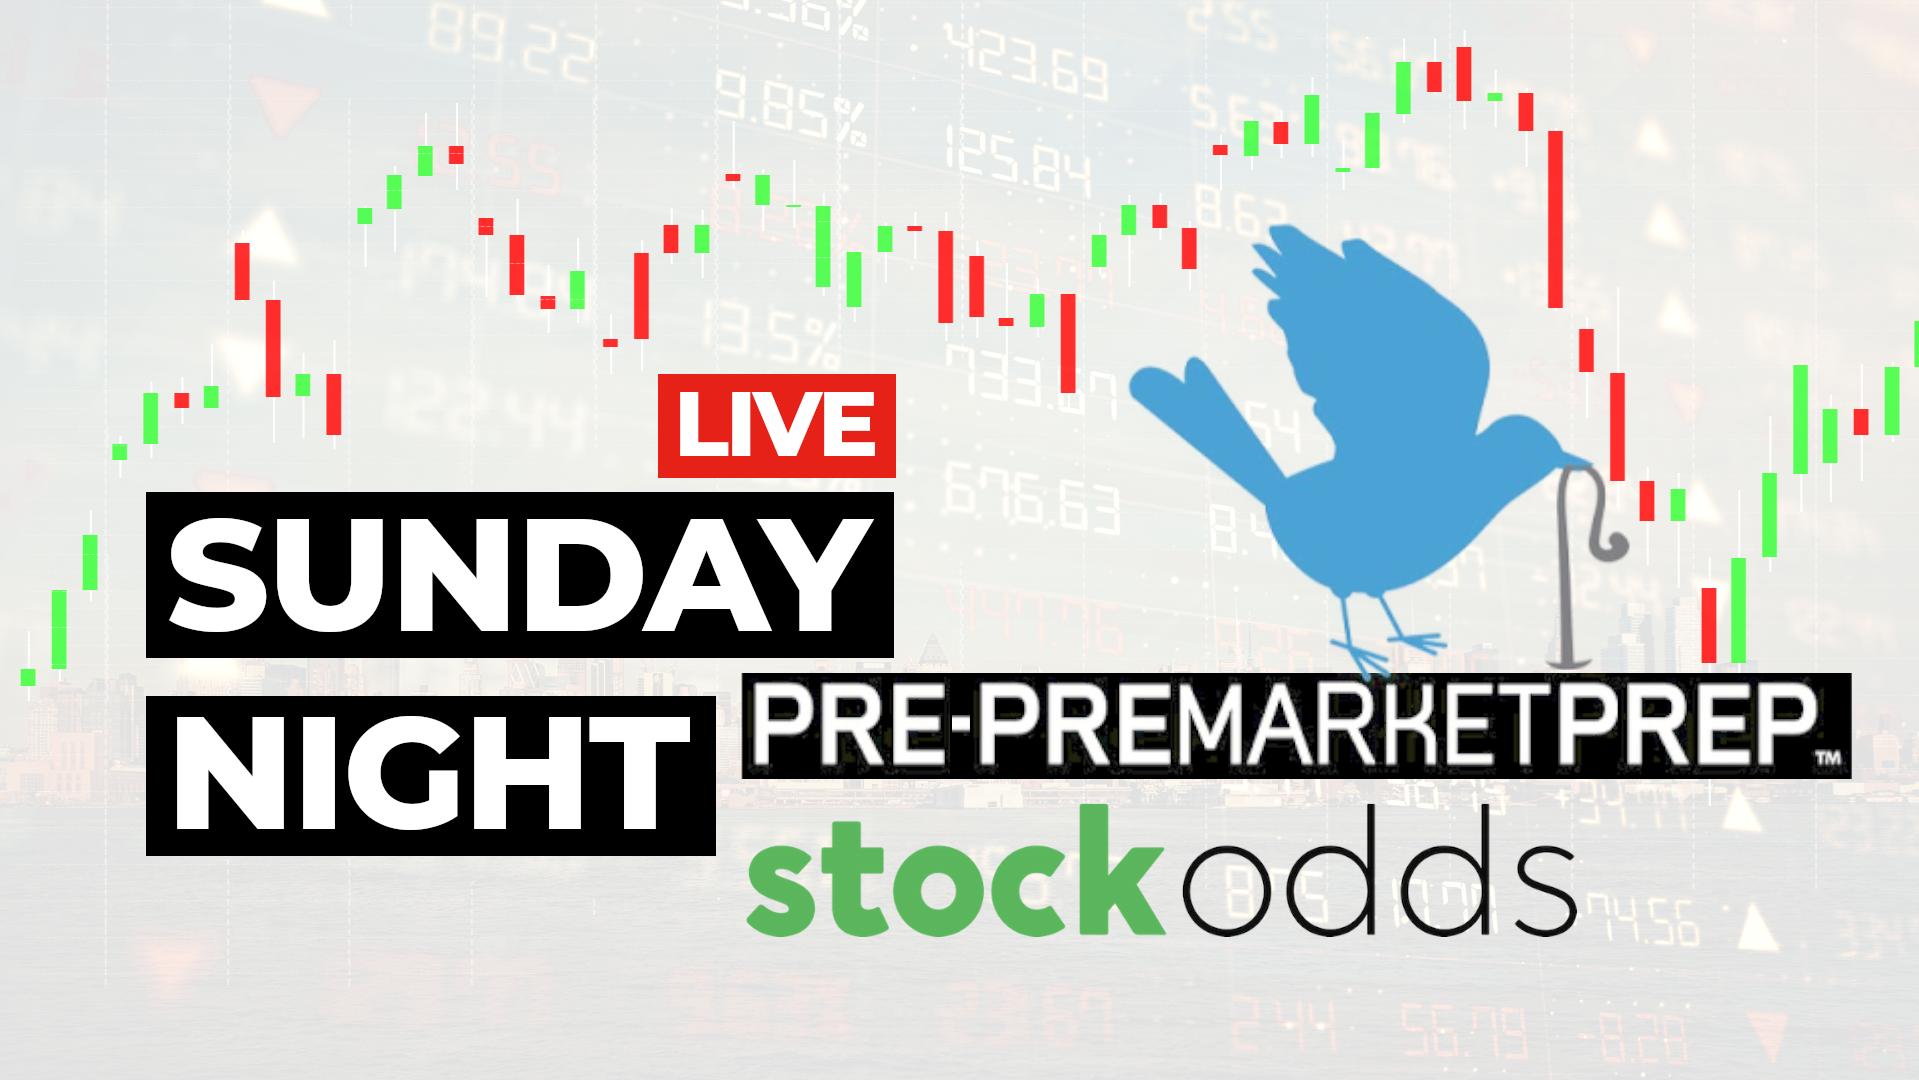 Sunday Night Pre-Premarket Prep with StockOdds